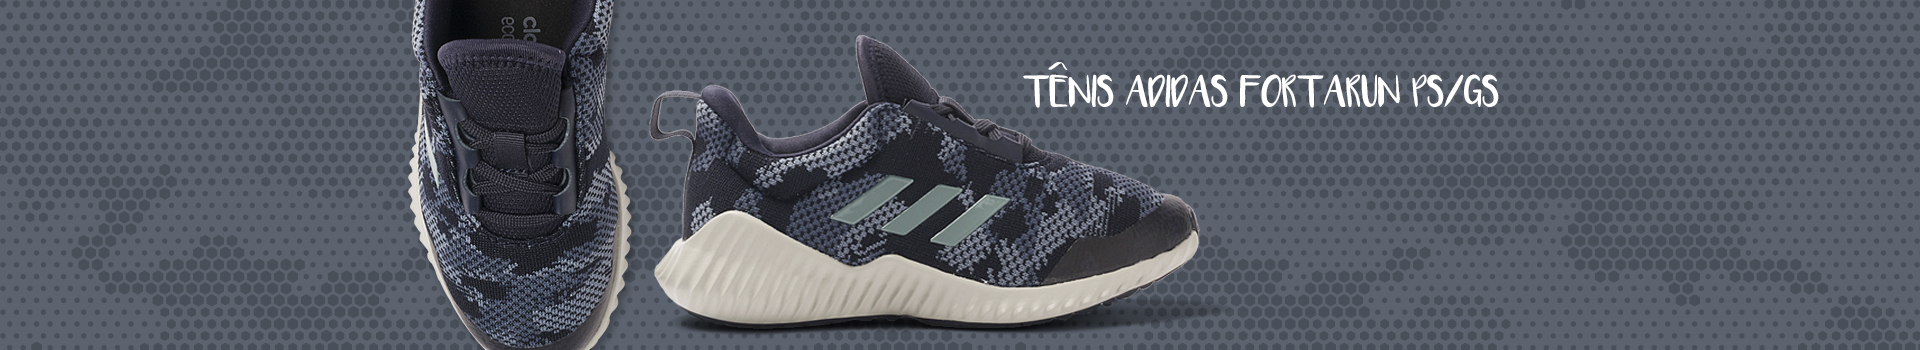 tvdesk_p4-14_09_18-adidas_Fortarun